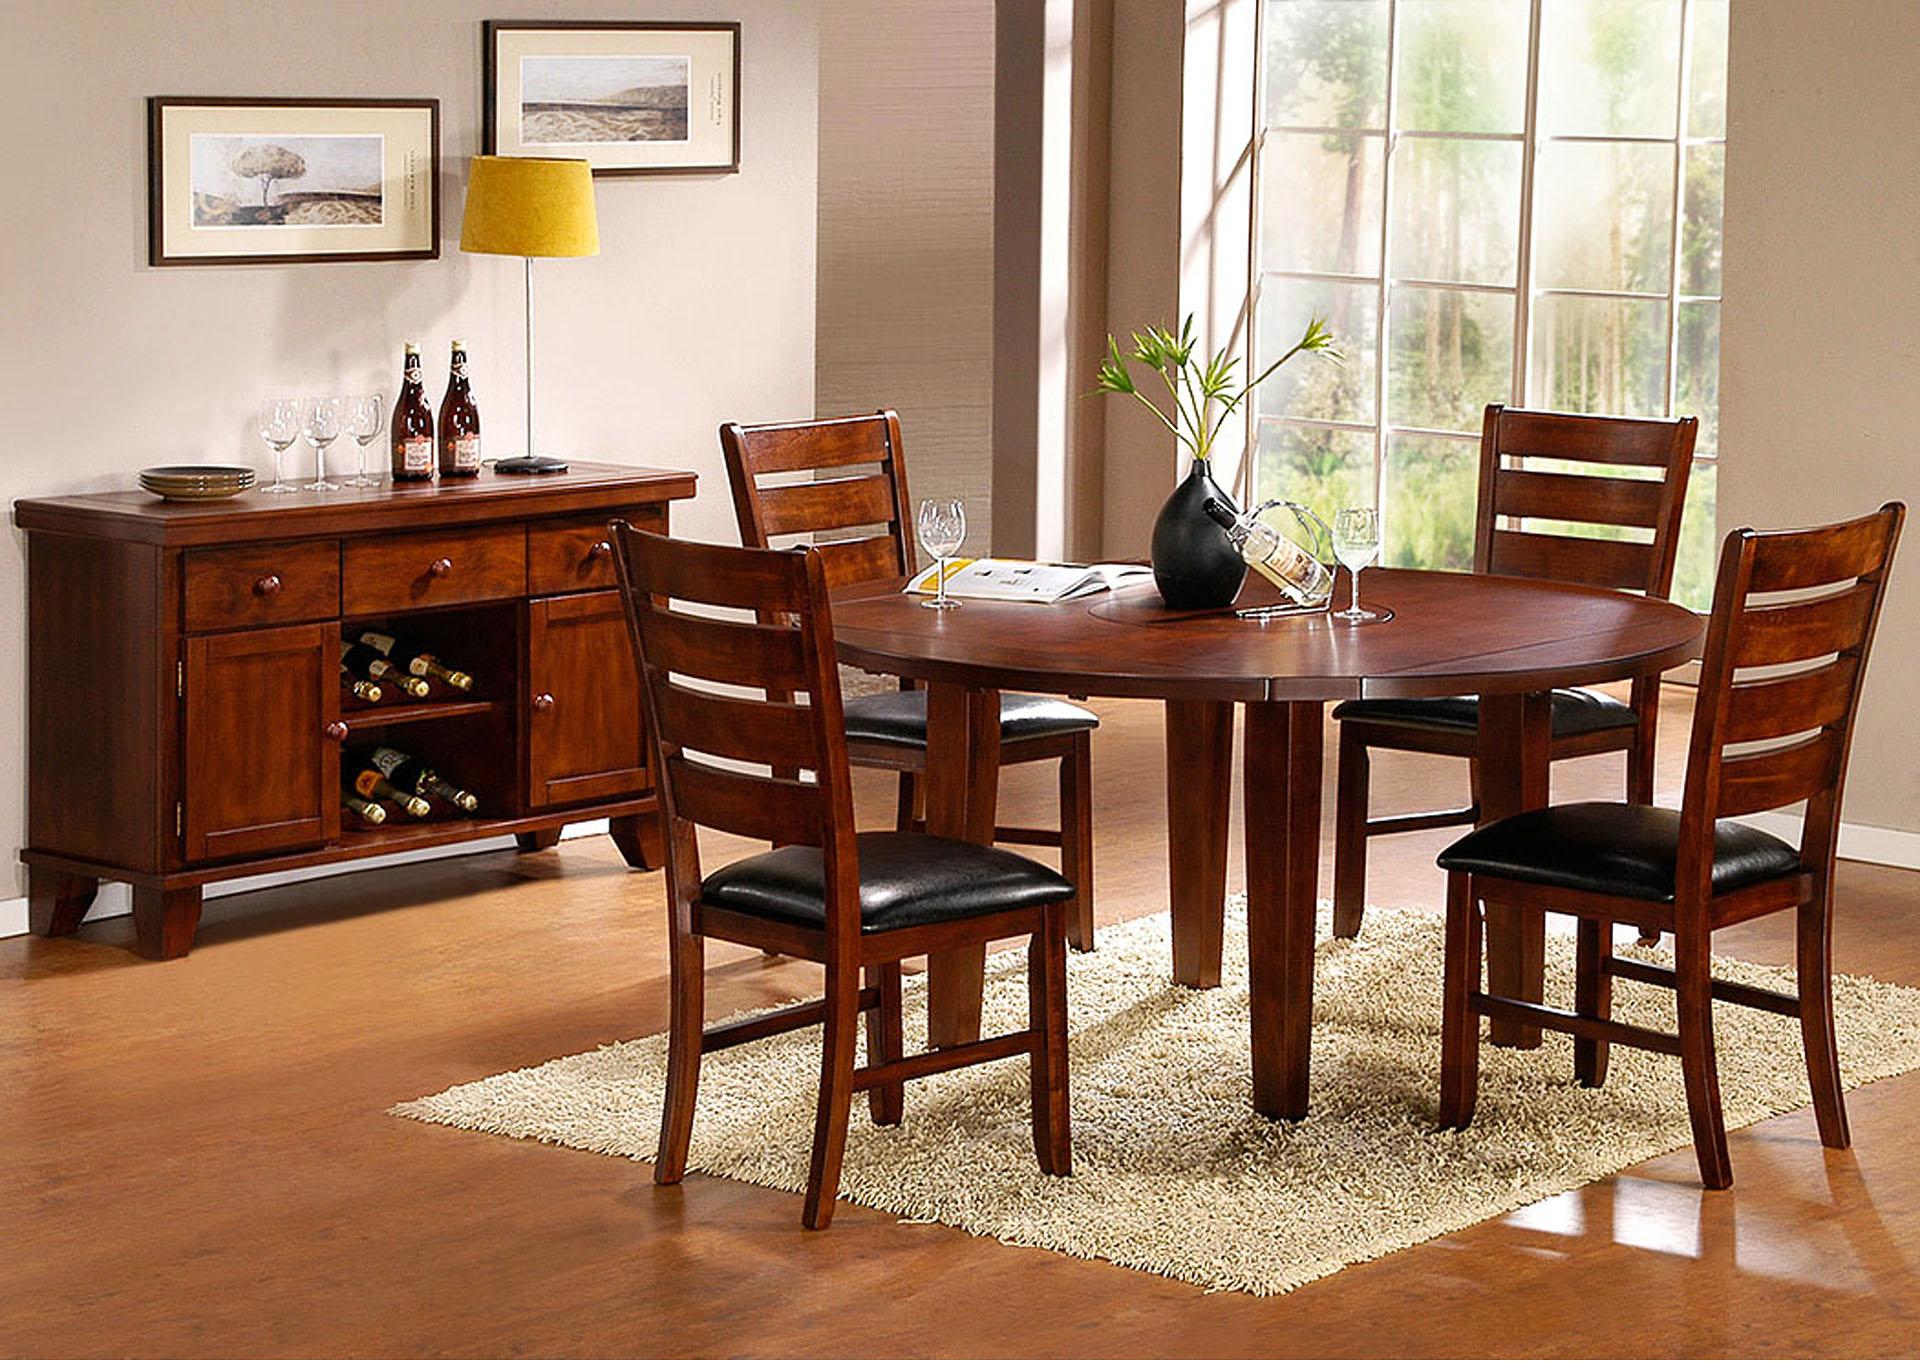 Leaf dining room